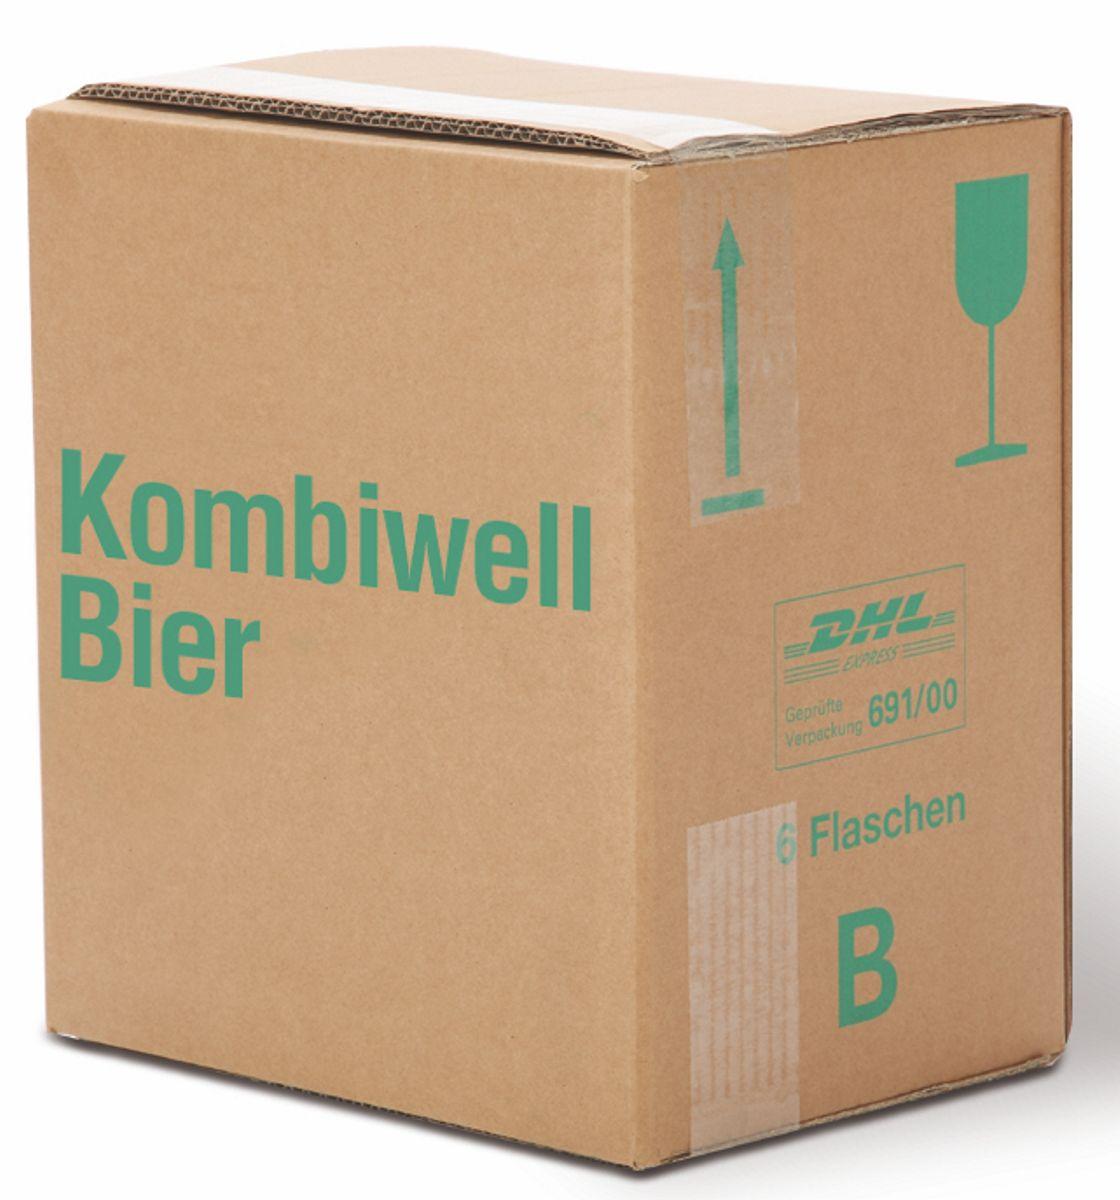 versandkarton 6er kombiwell bier stehend. Black Bedroom Furniture Sets. Home Design Ideas